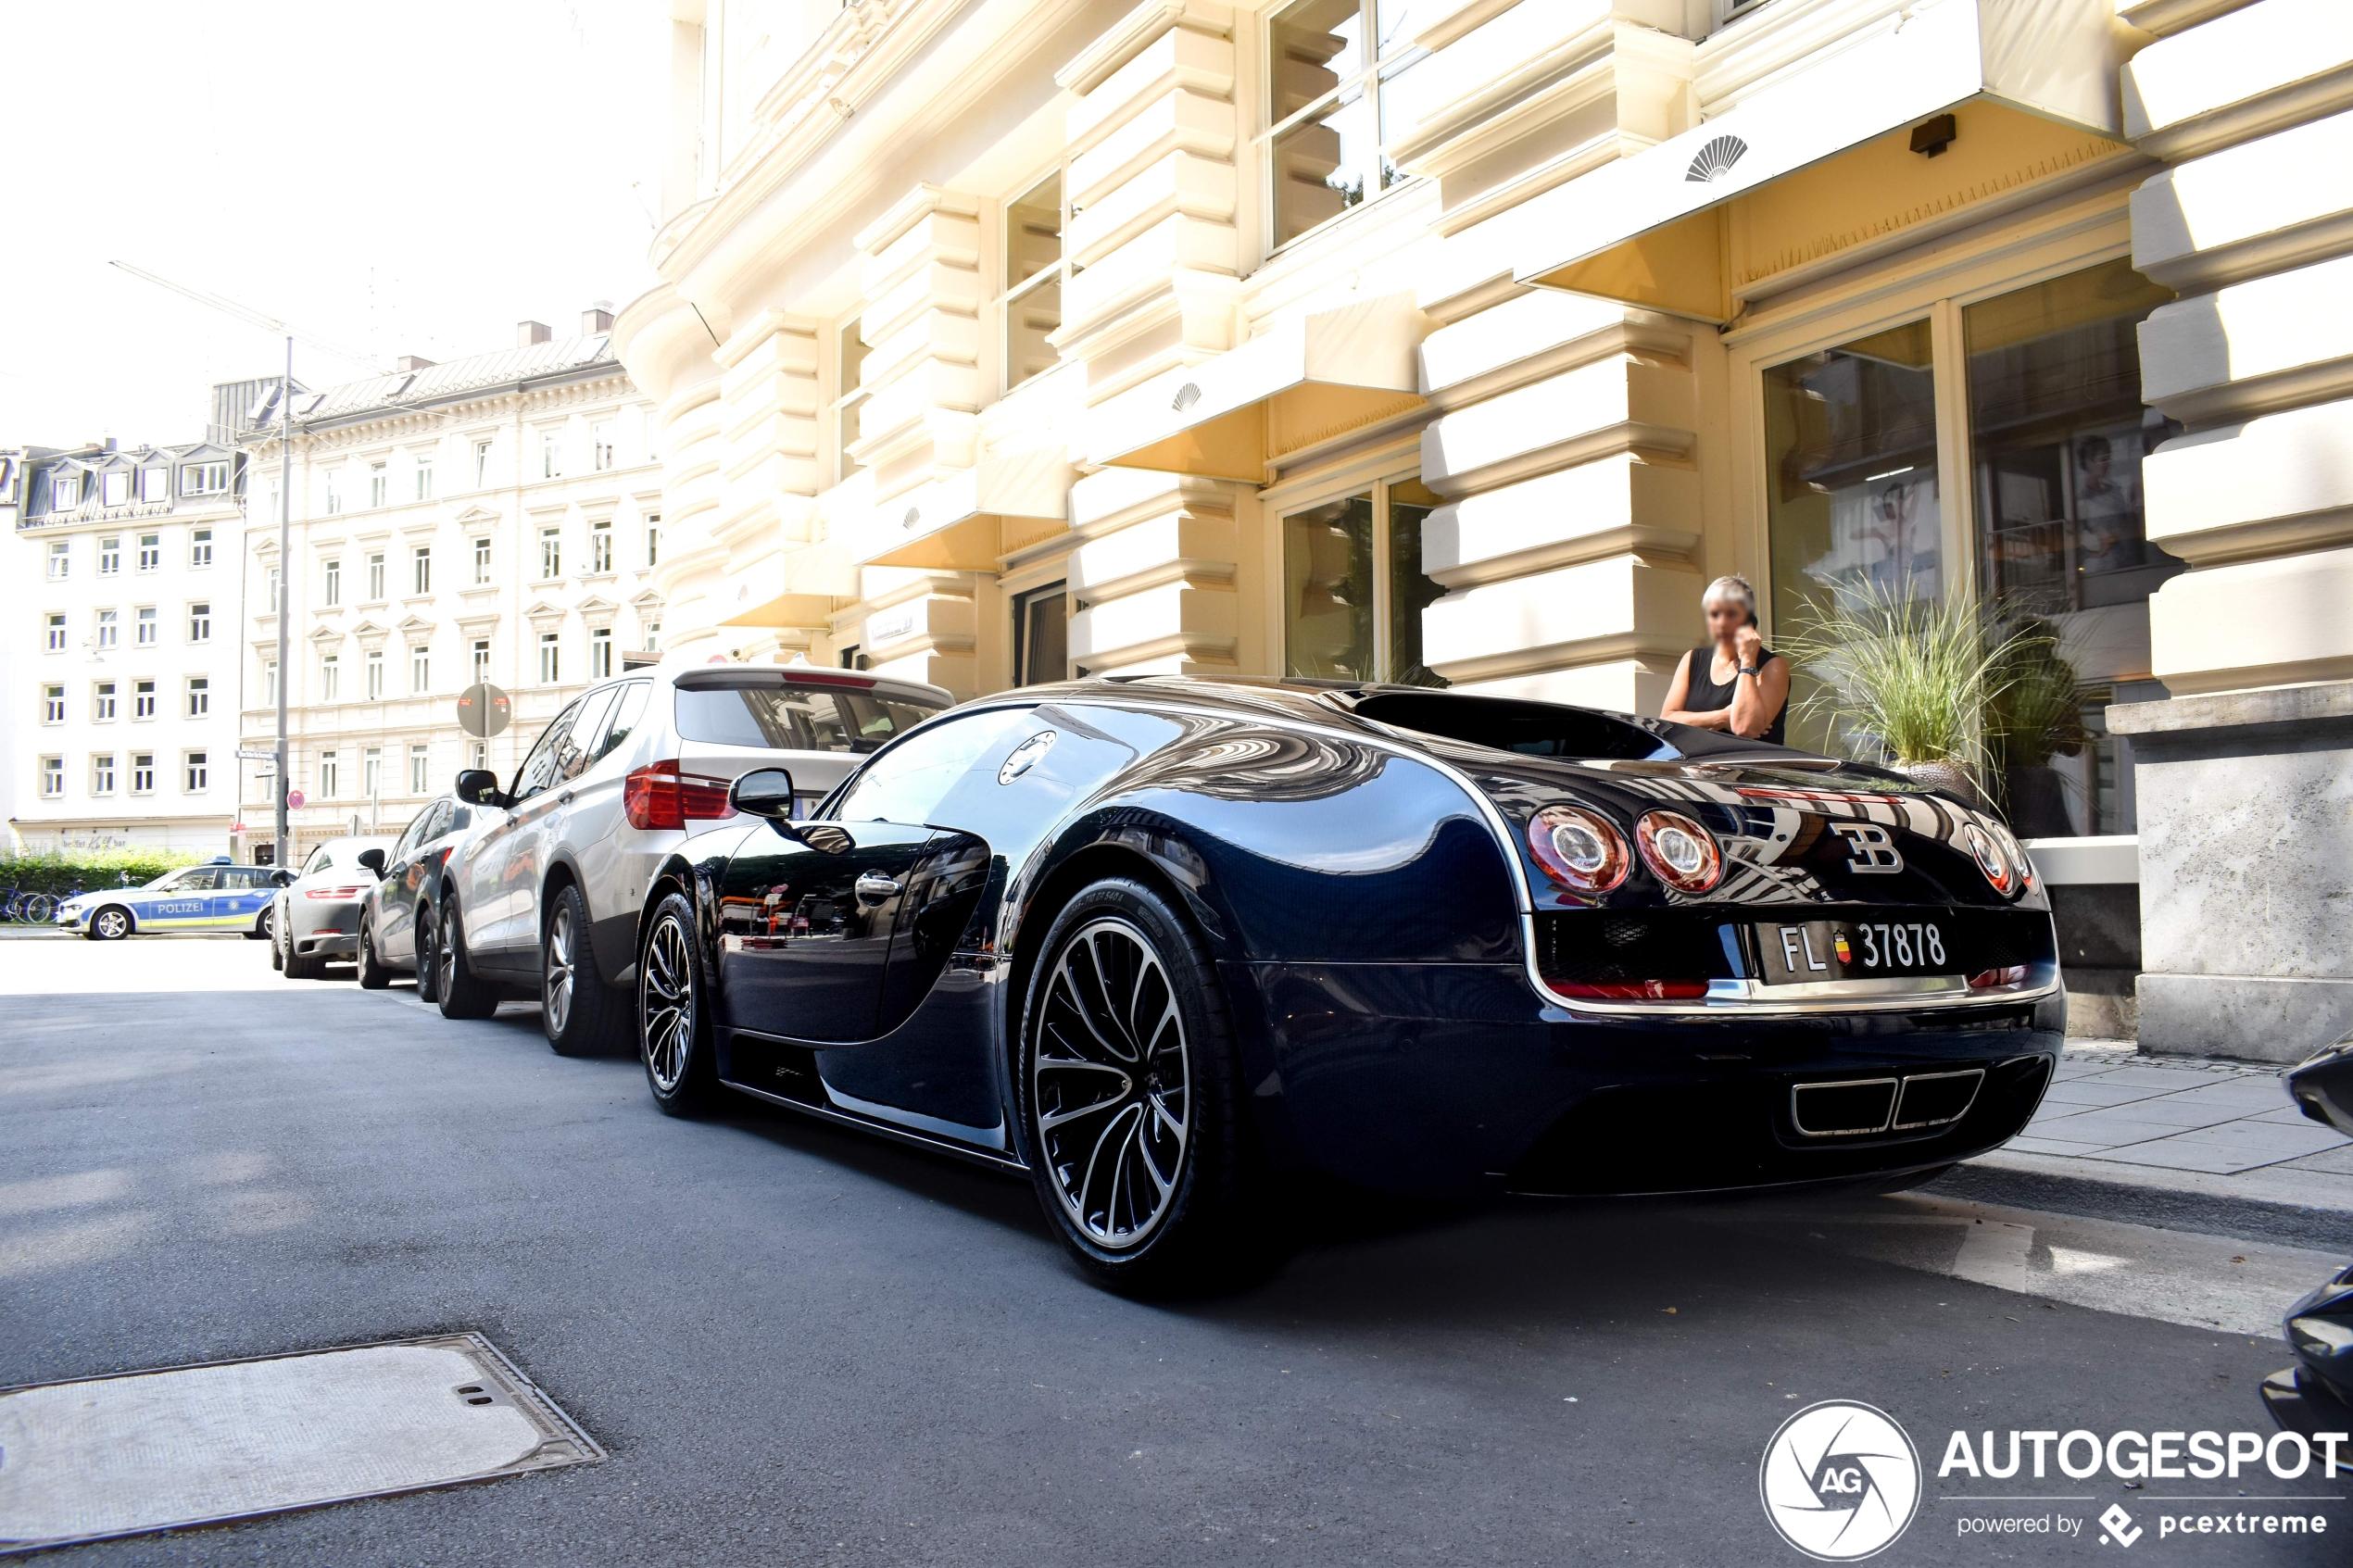 Bugatti Veyron 16.4 Super Sport draagt carbon fiber body met trots